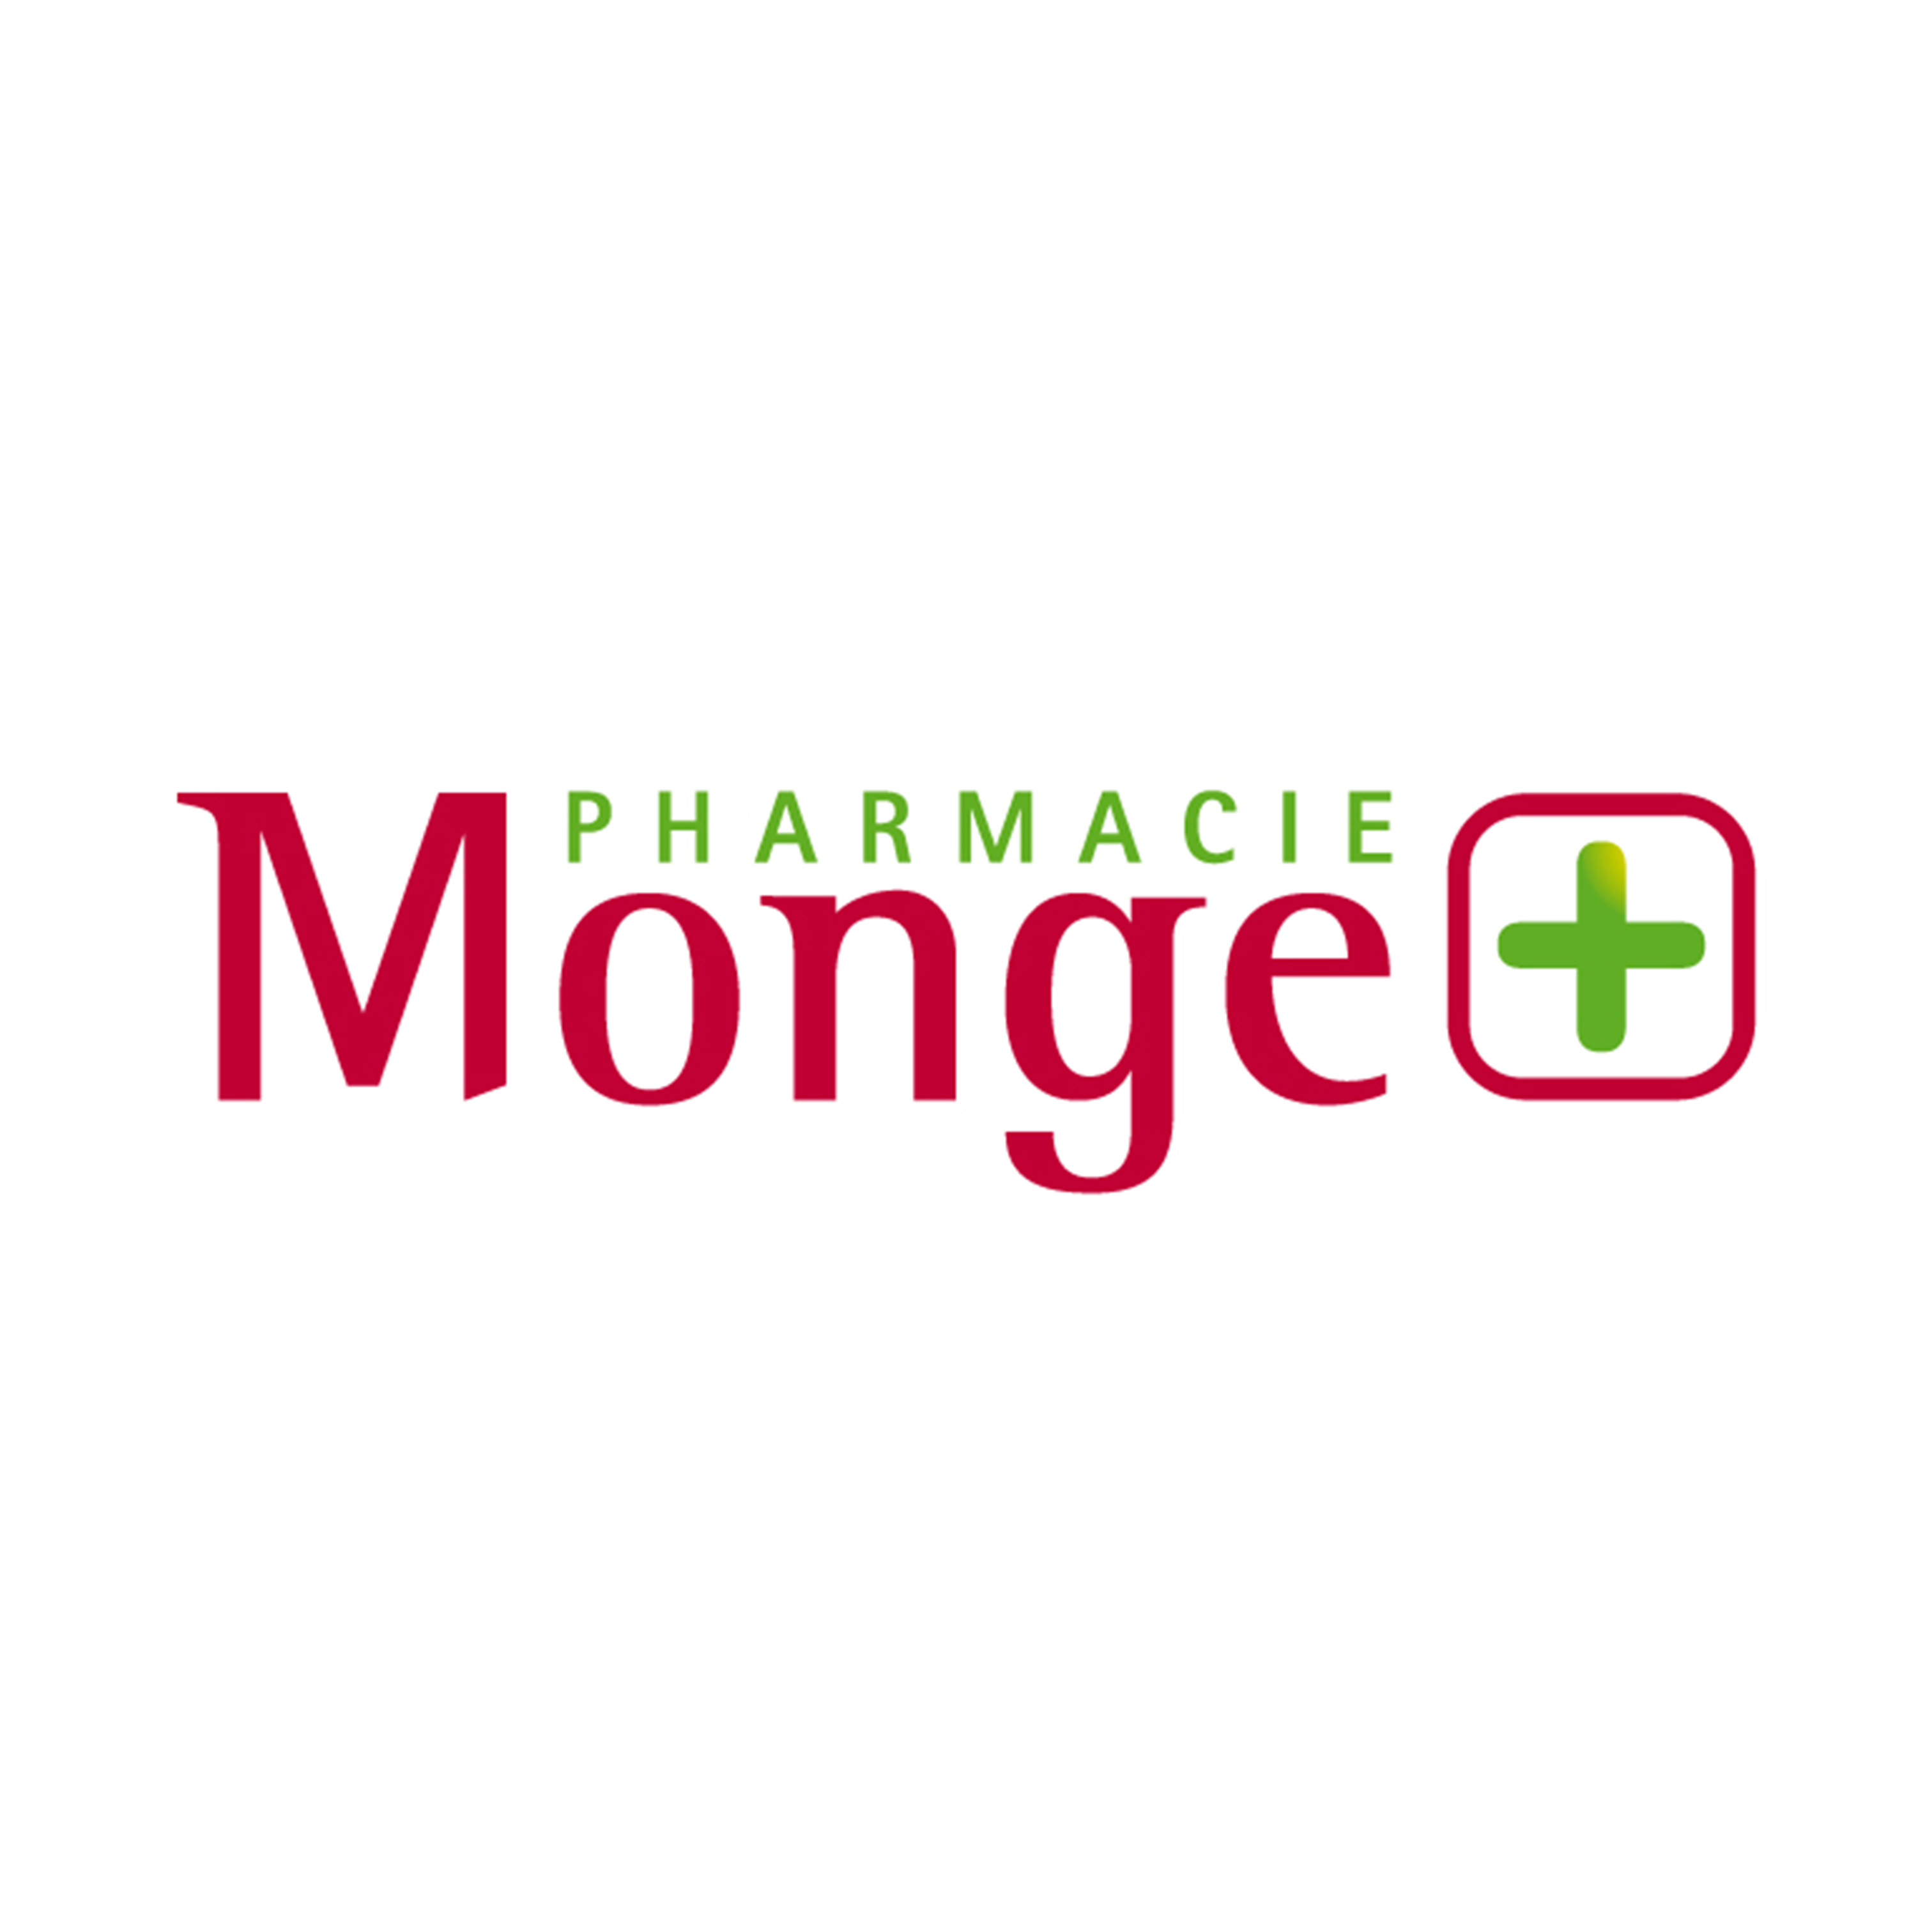 pharmacie-monge